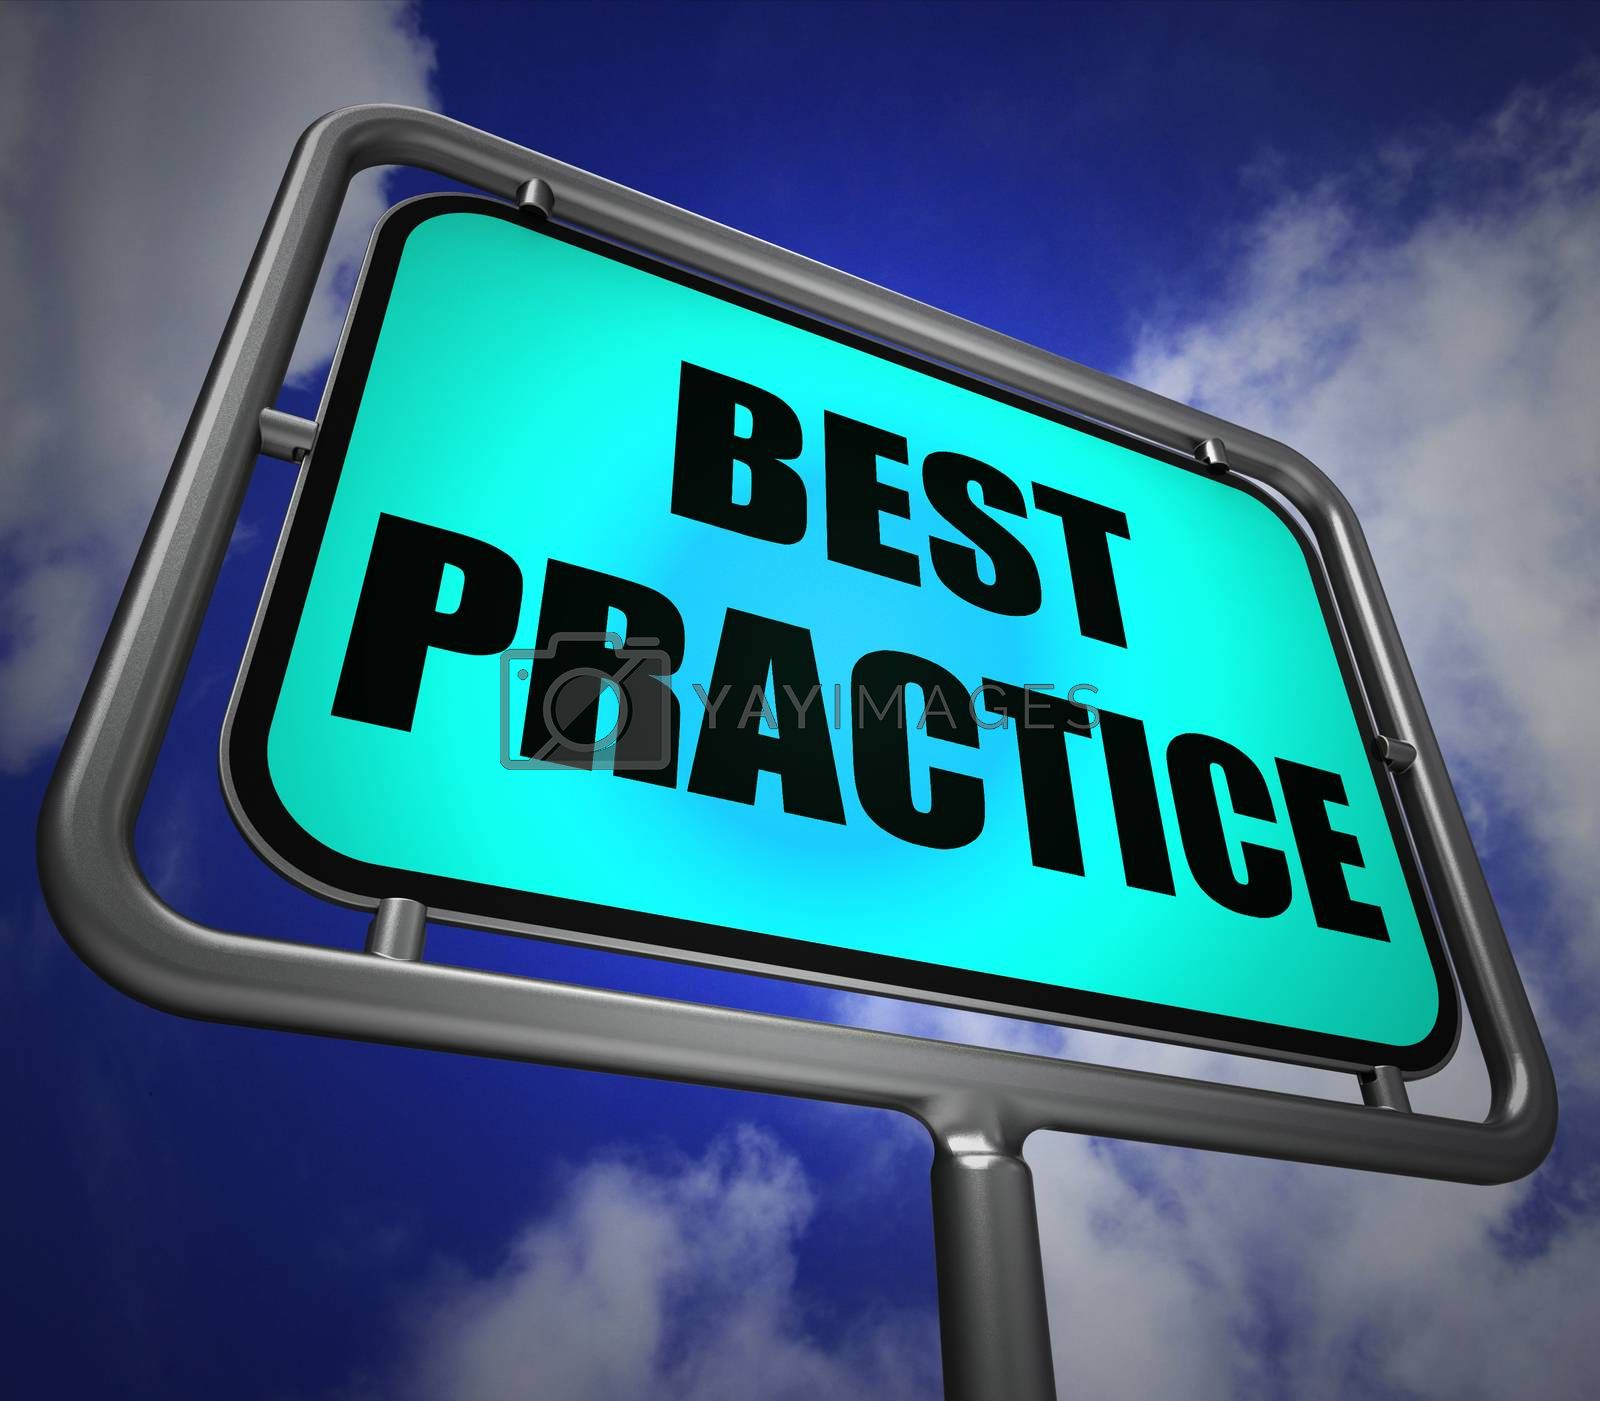 Best Practice Signpost Indicates Better and Efficient Procedures by stuartmiles